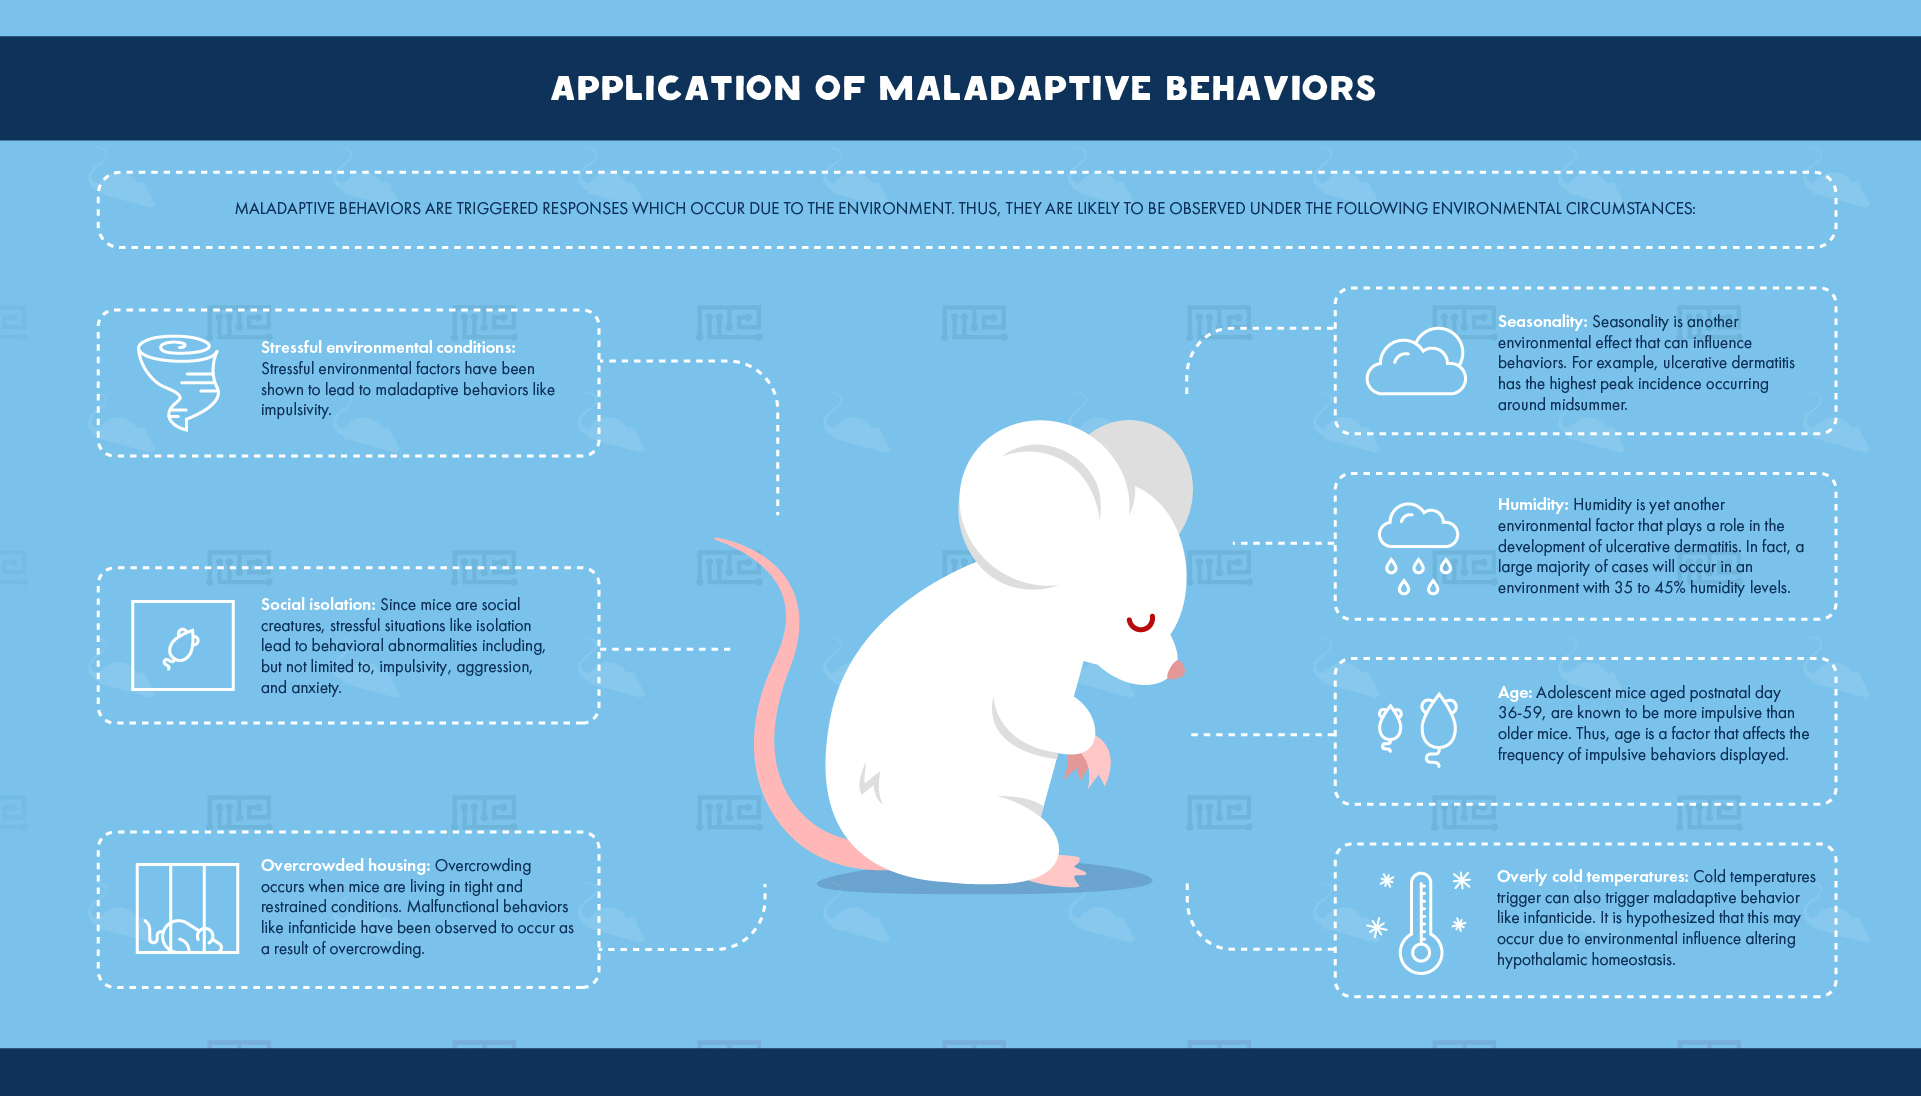 Application of Maladaptive Behaviors